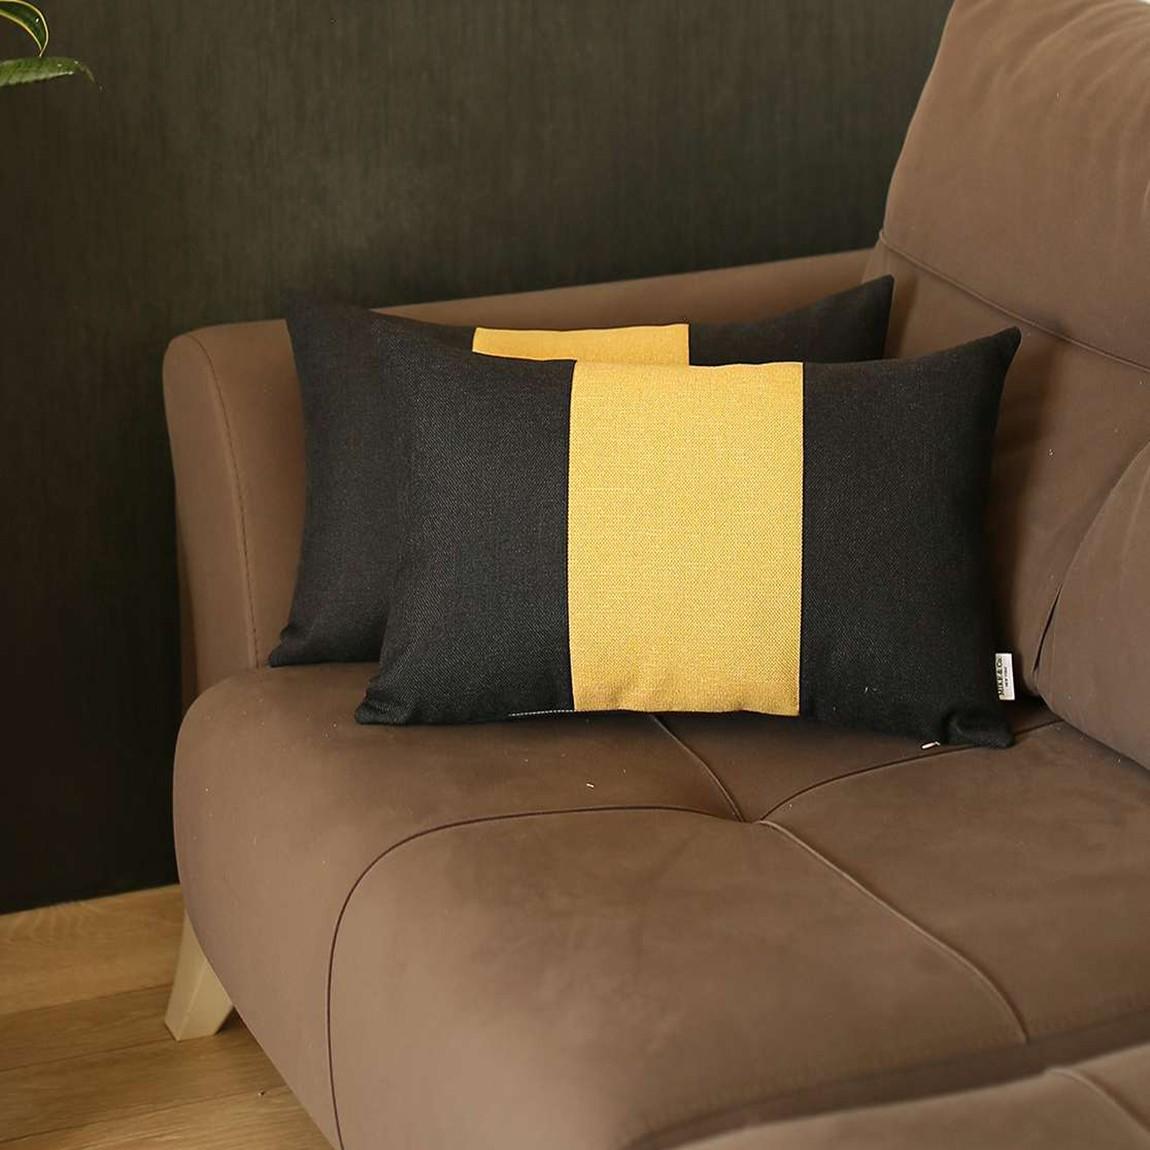 Set of 2 Black and Yellow Lumbar Pillow Covers